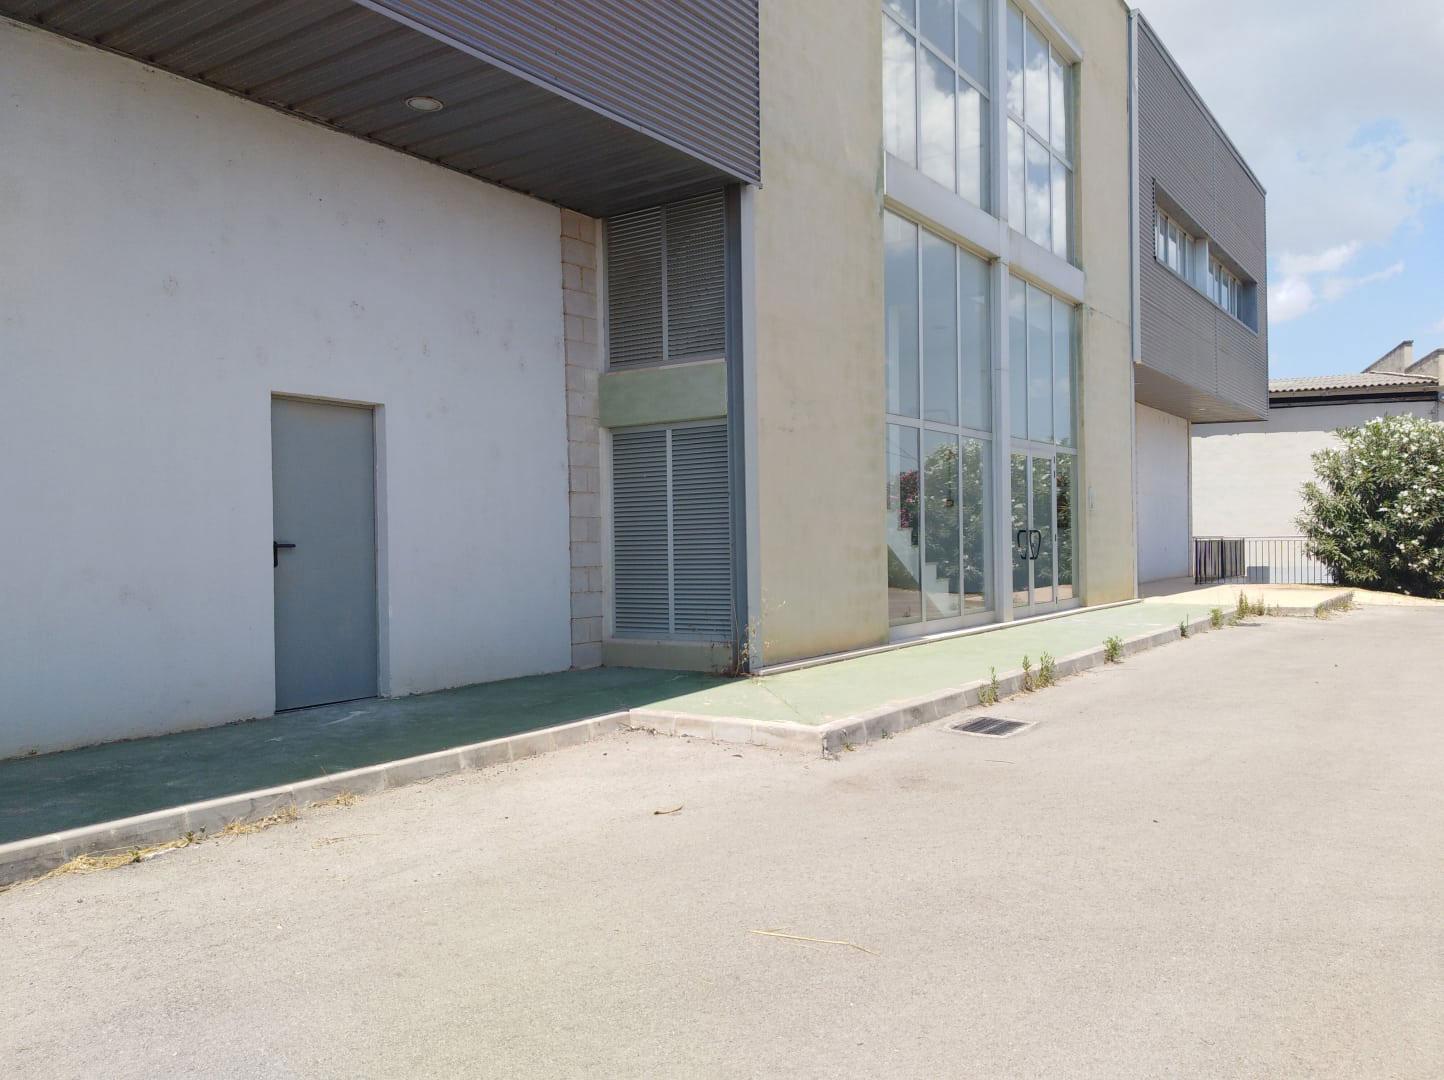 Oficina en venta en Porreres, Baleares, Carretera Campos, 80.389 €, 172 m2